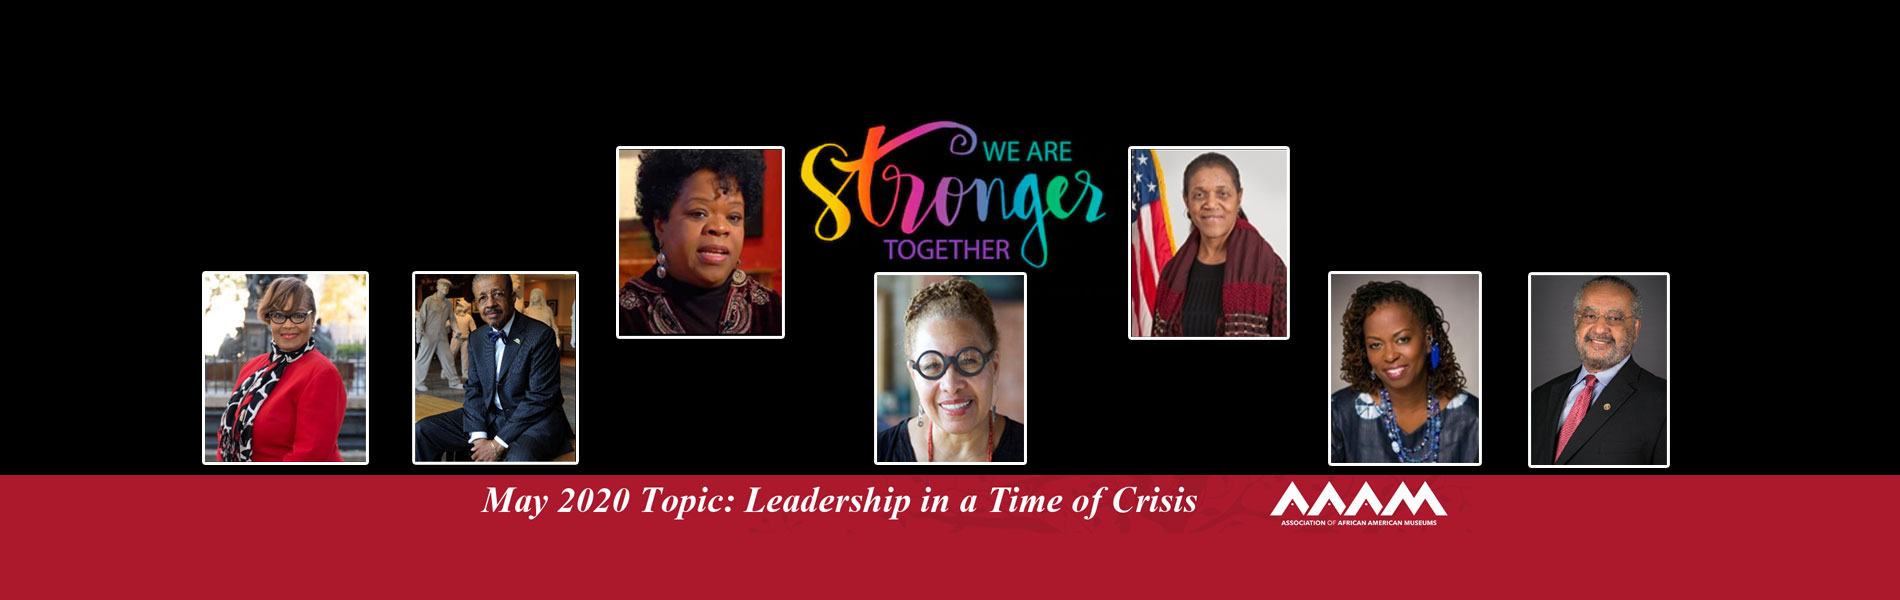 Regional Leadership Conversations Initiative